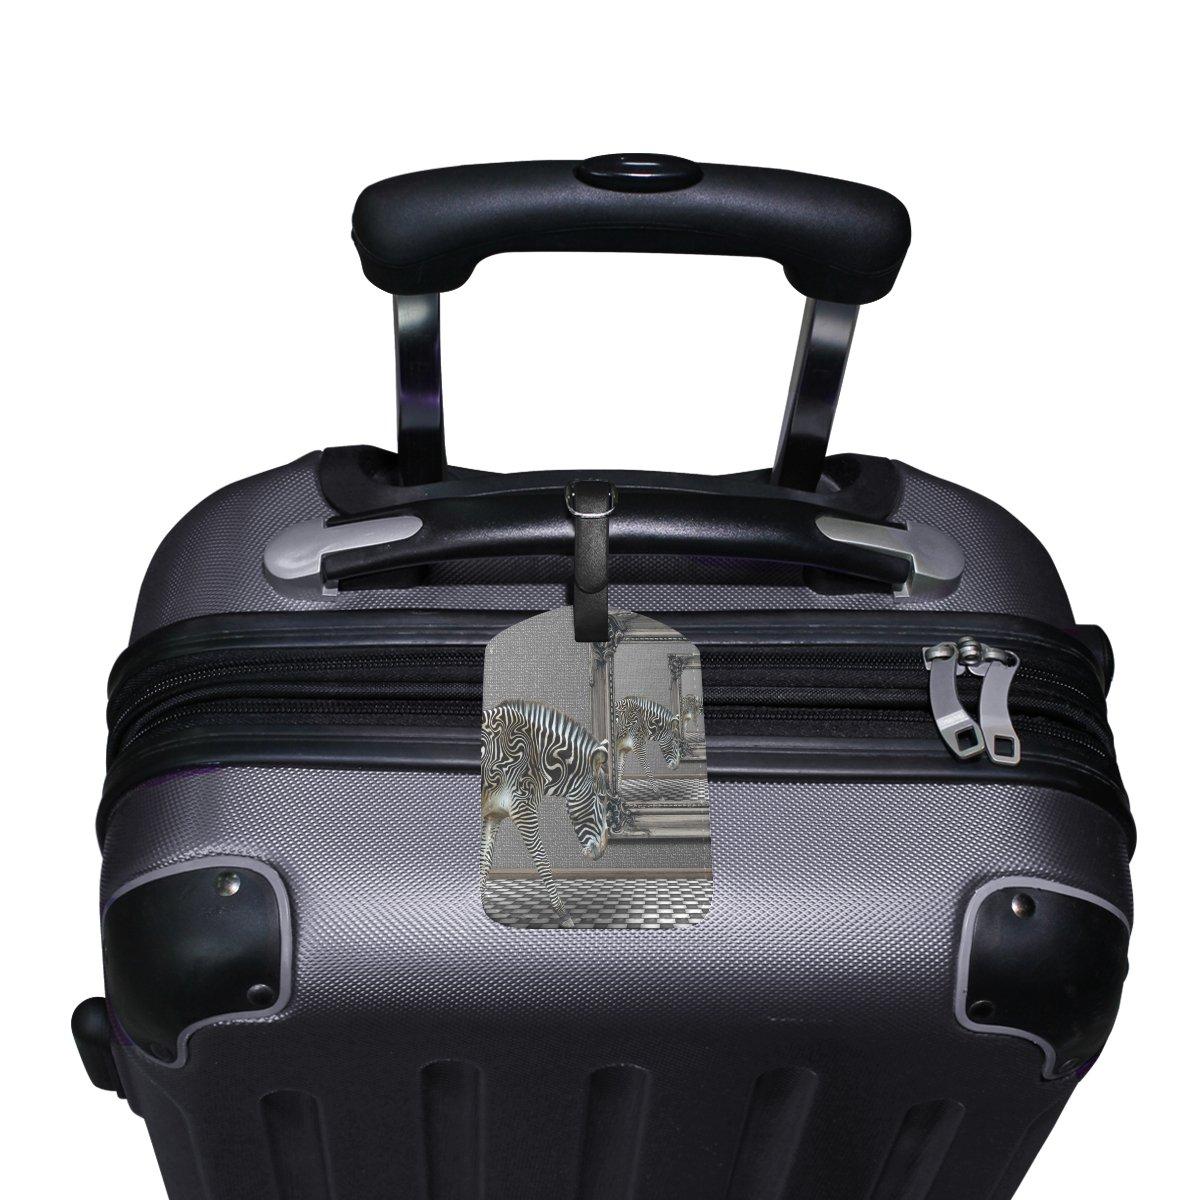 Saobao Travel Luggage Tag Zebra PU Leather Baggage Suitcase Travel ID Bag Tag 1Pcs